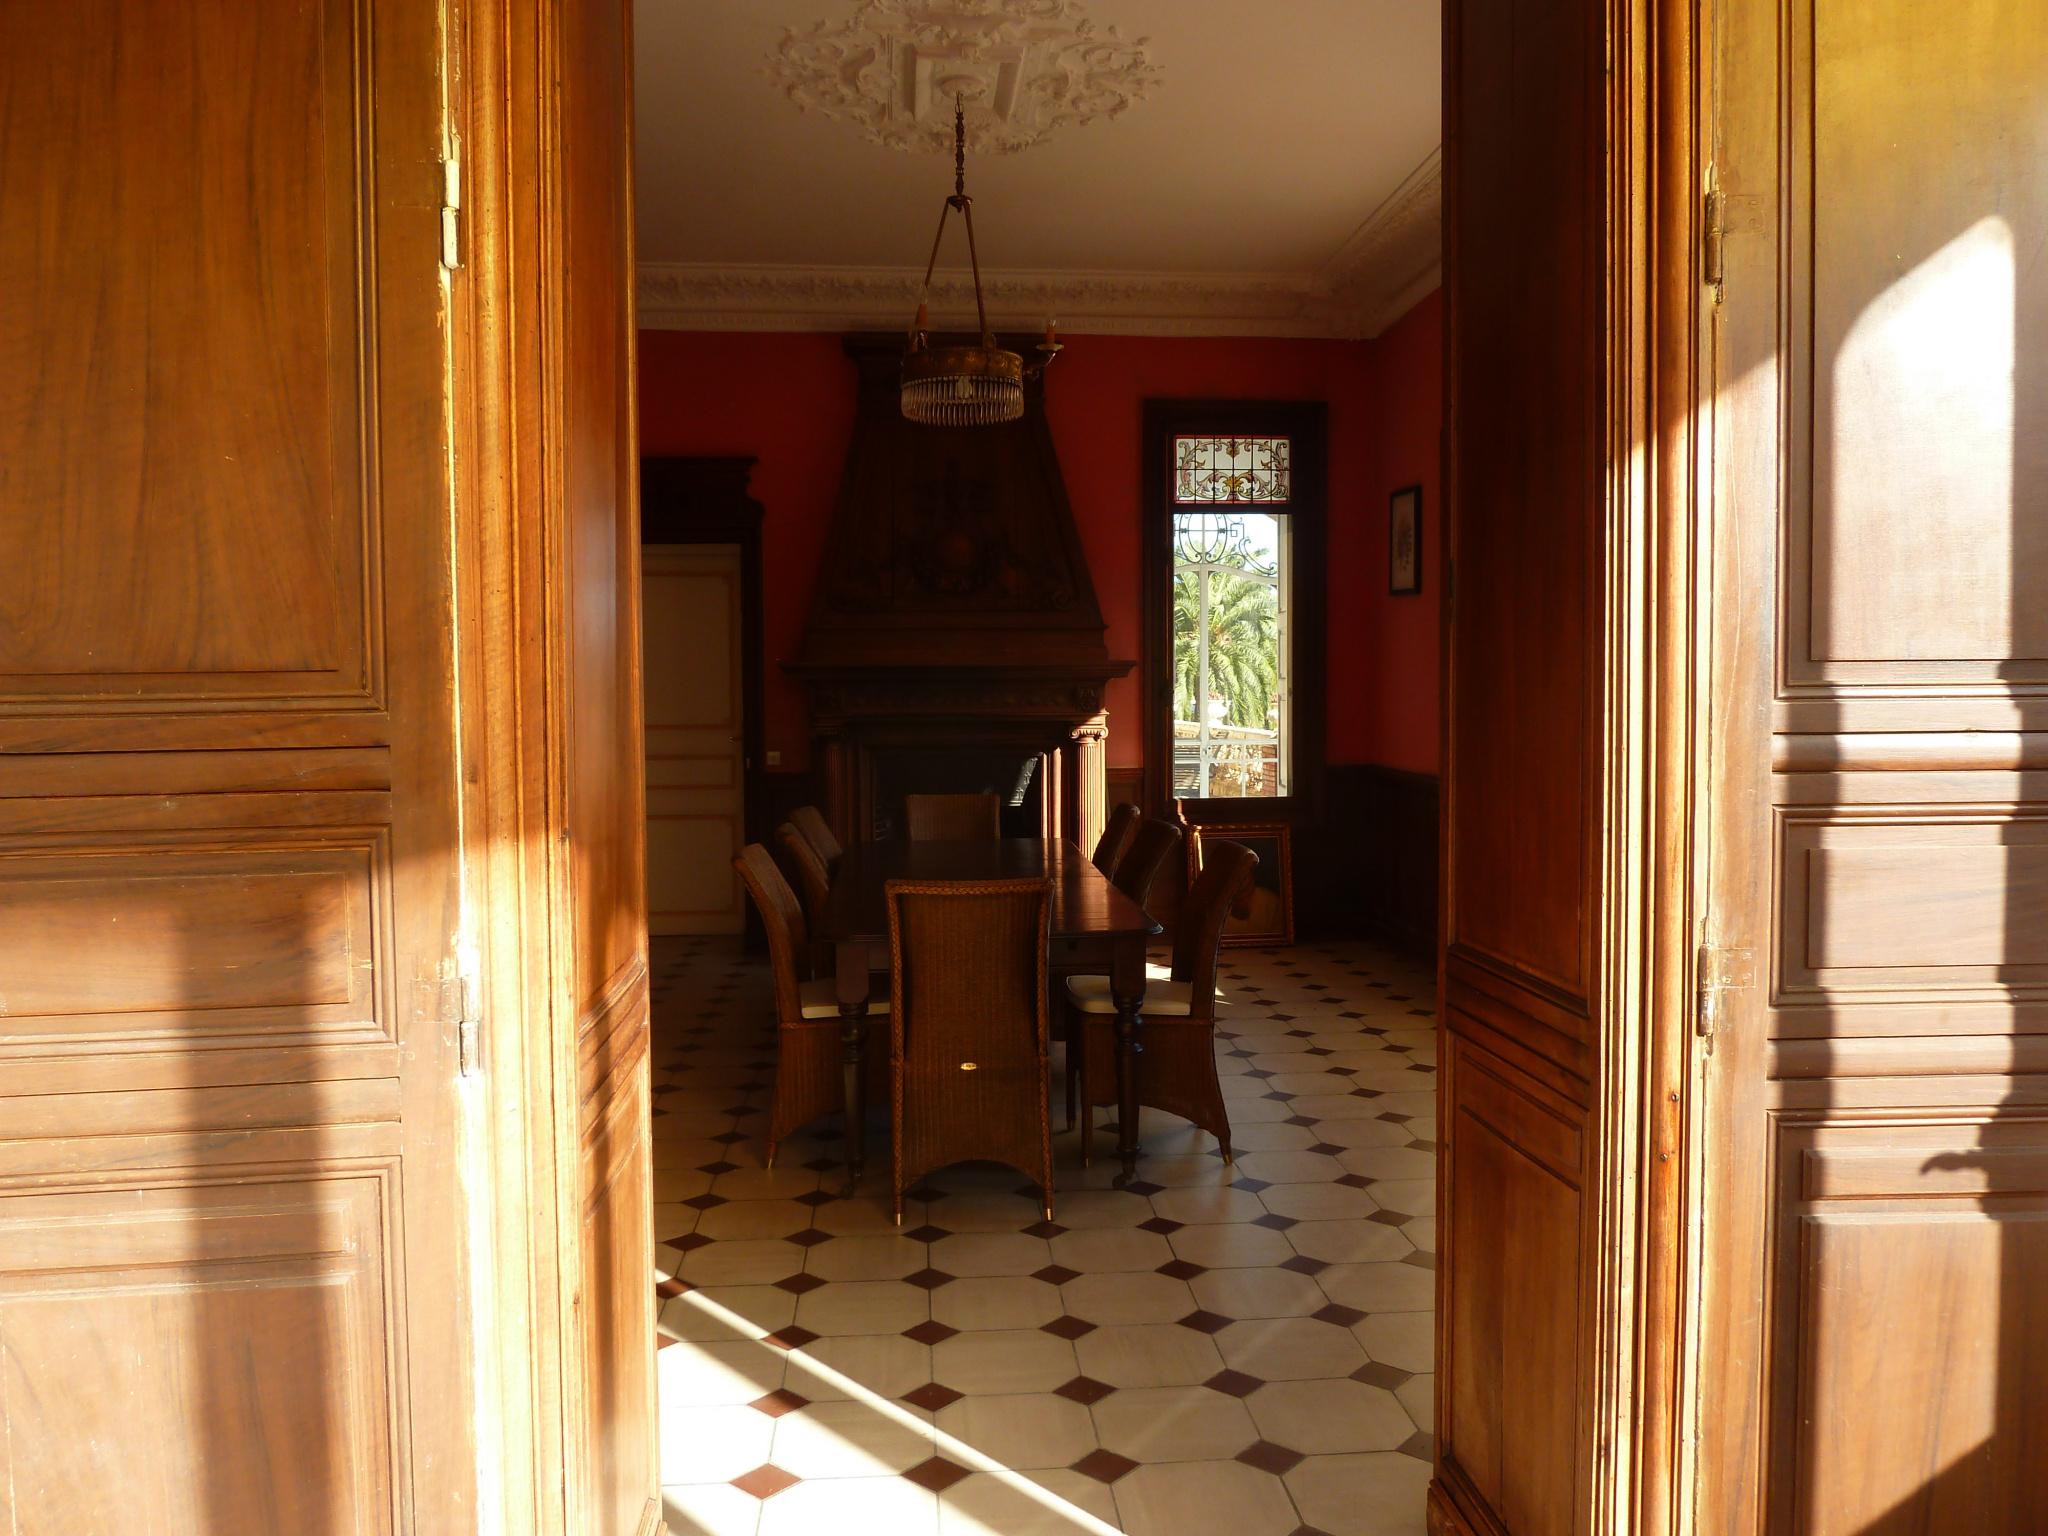 À vendre chateau de 760m2 à brouilla (66620) - Photo 17'